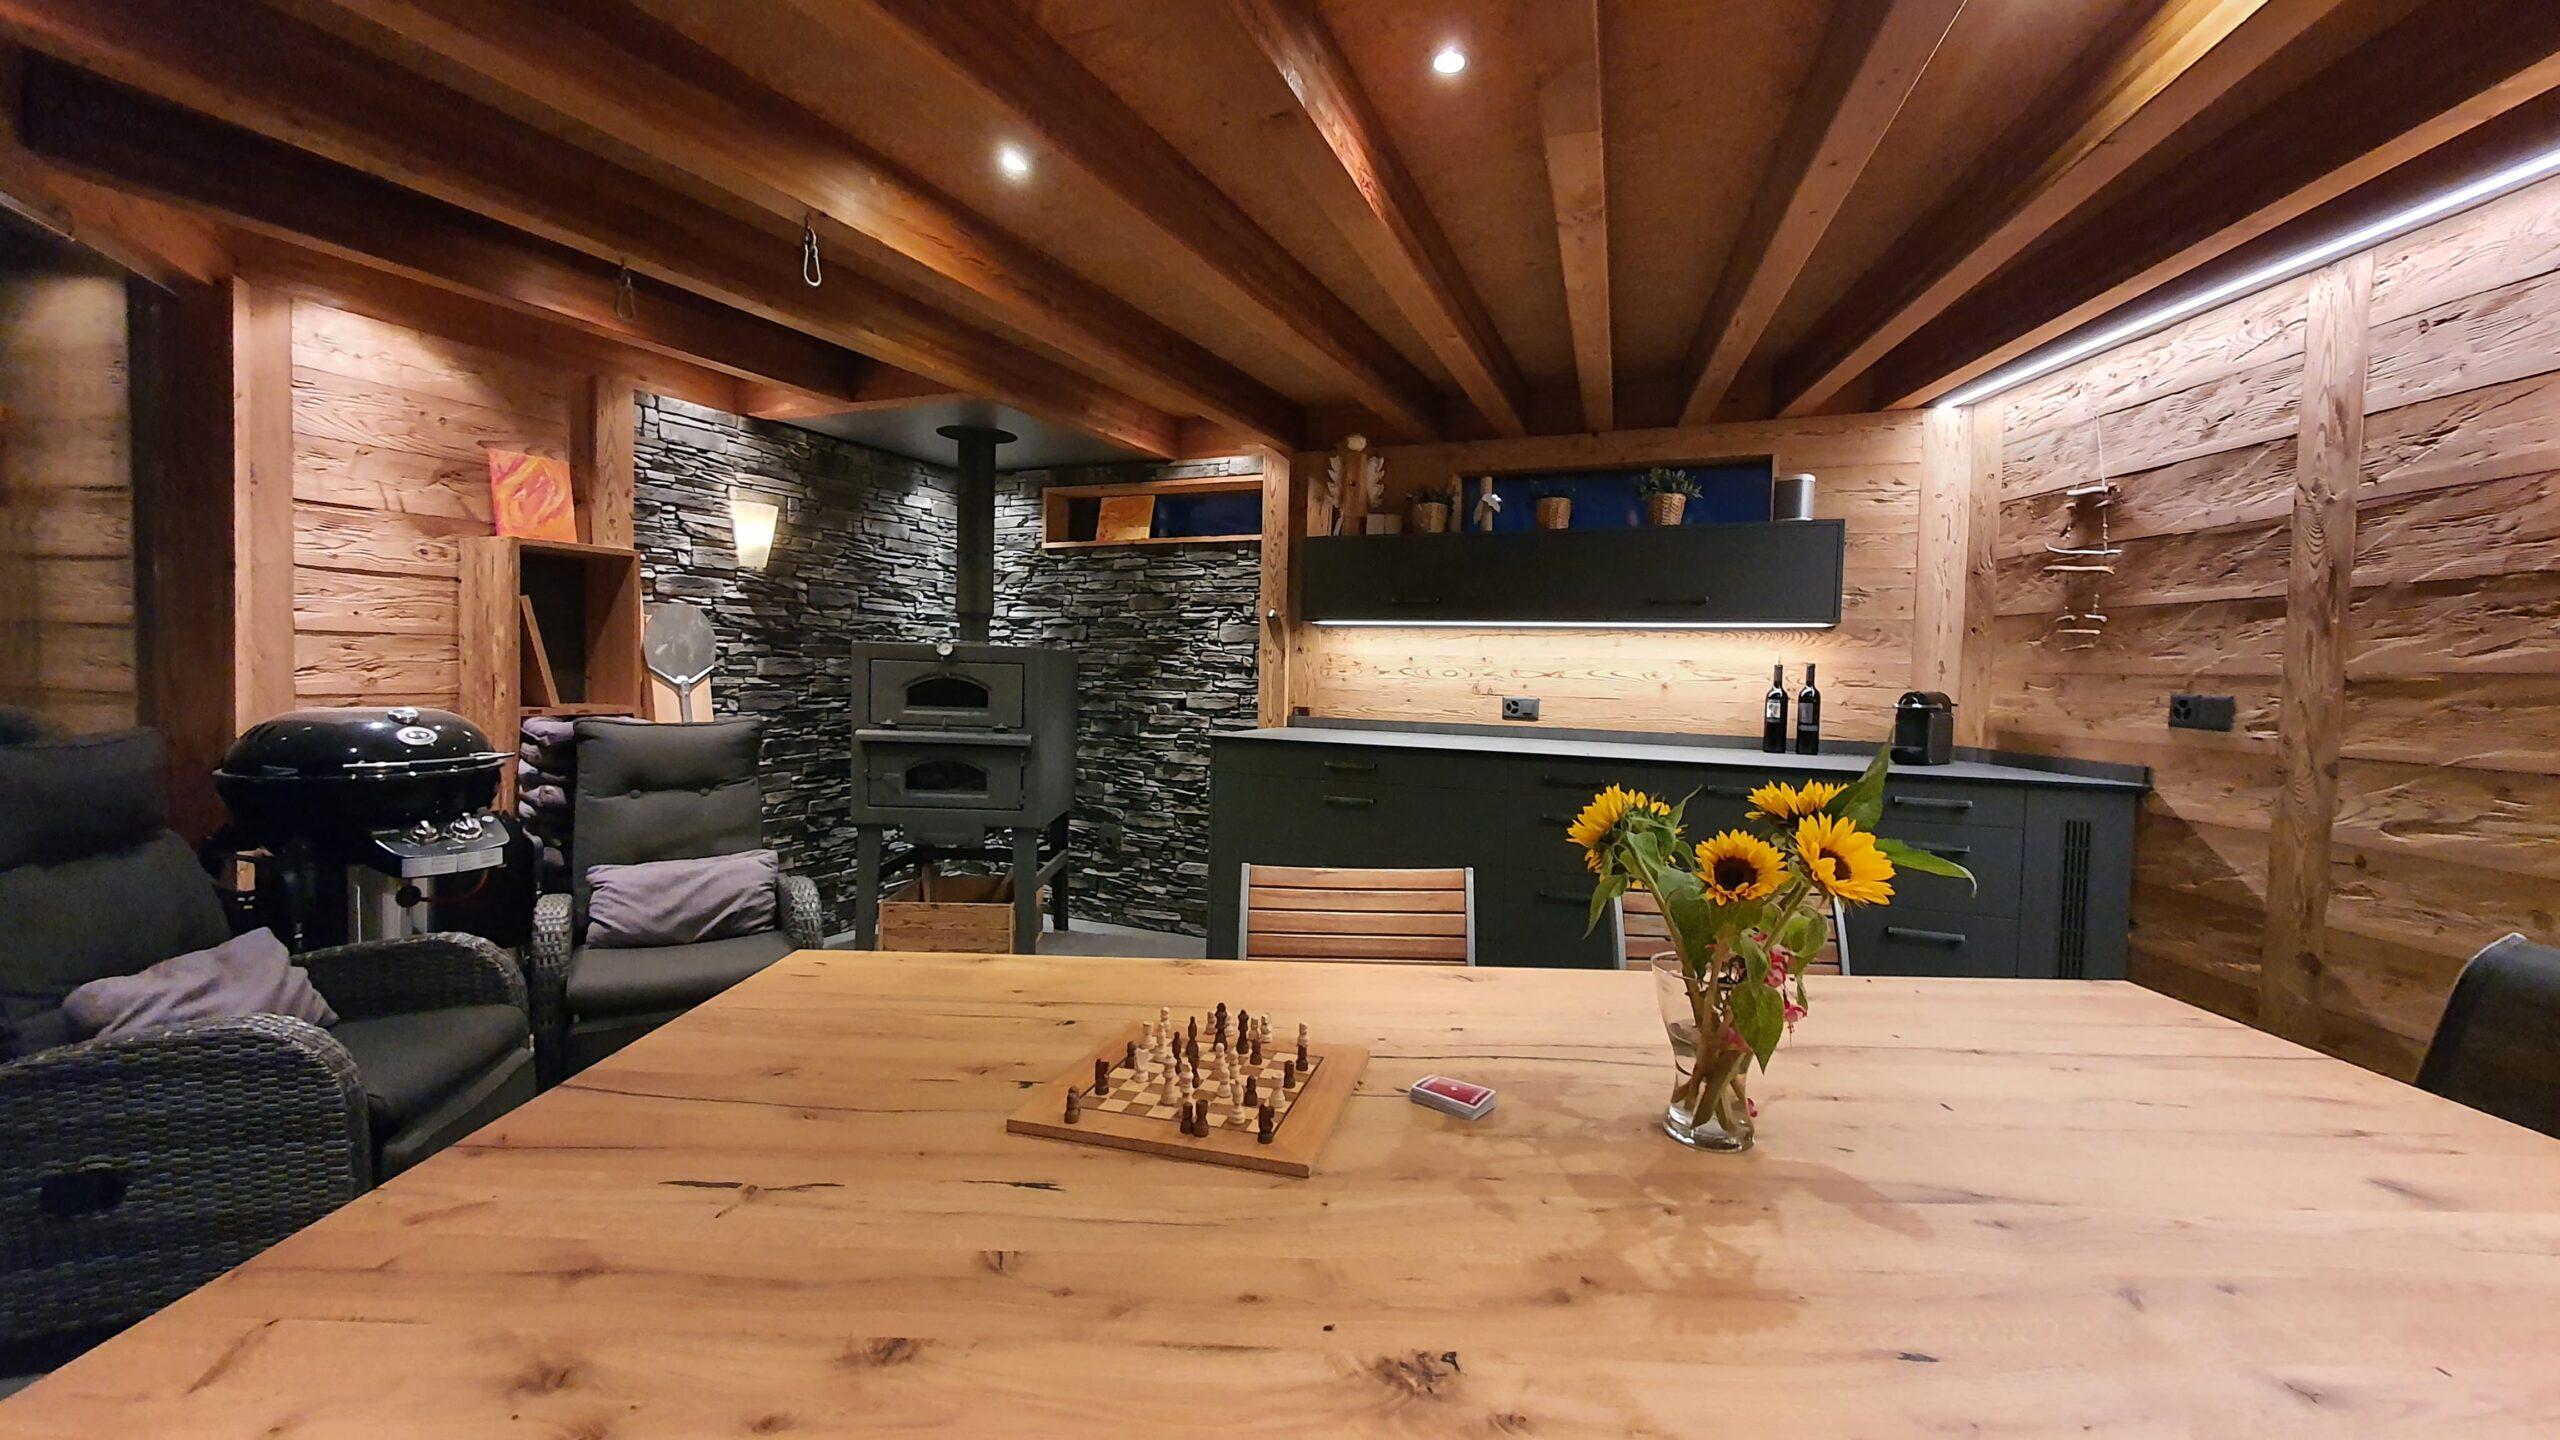 Wooddesign_Holzdesign_Pergola_Outdoor-Küche_Altholz_modern_rustikal_Pizzaofen_Steinwand_LED-Beleuchtung_Outdoor-Sessel_Esstisch (4)